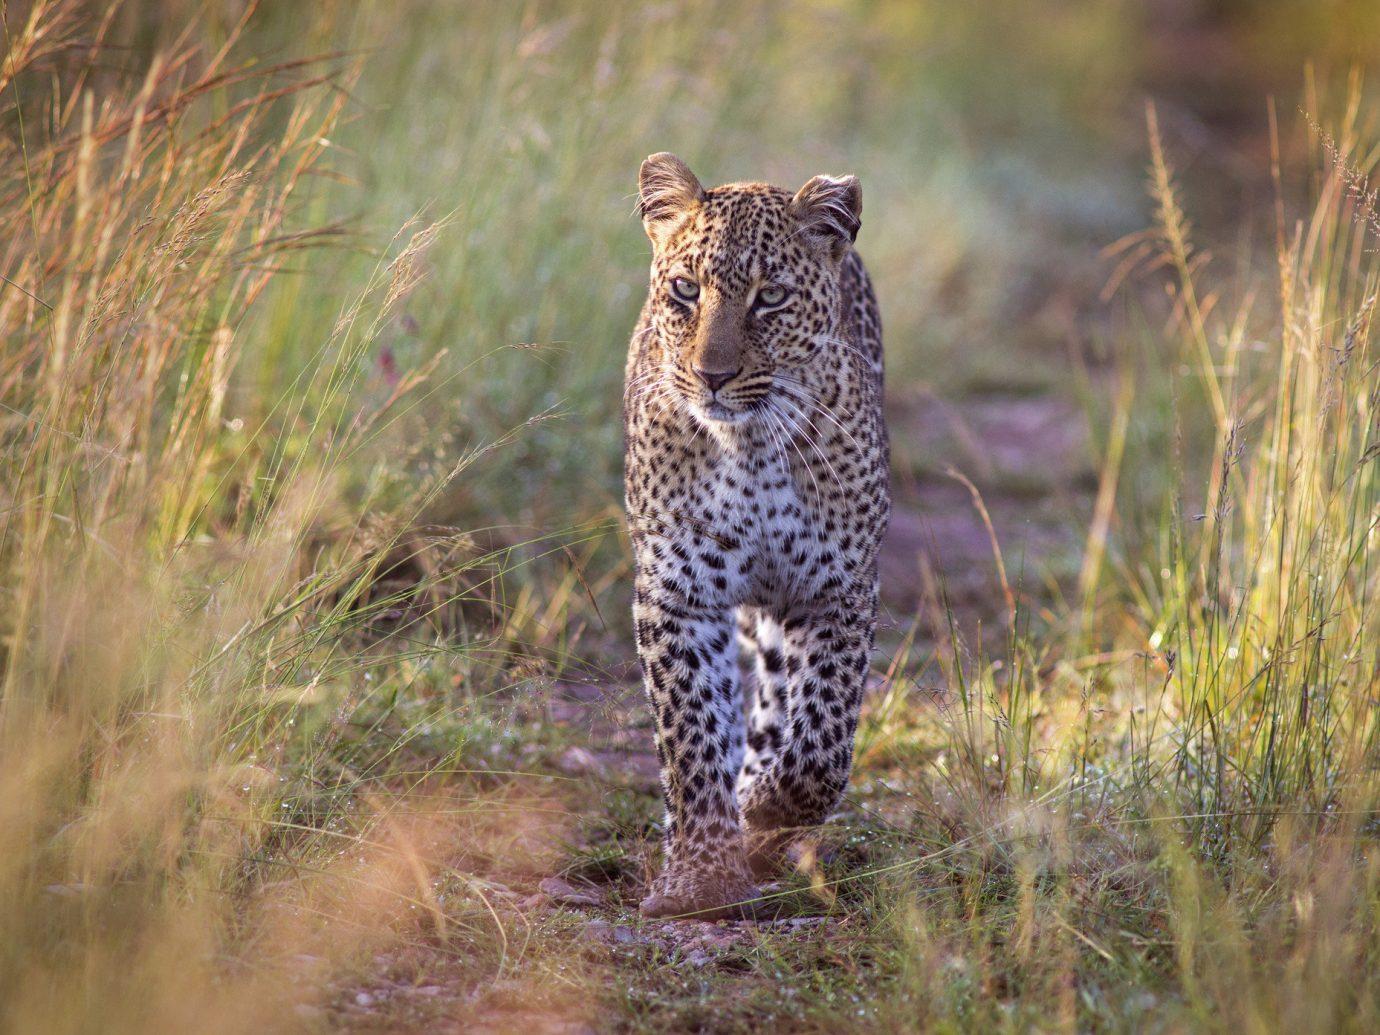 Offbeat grass outdoor animal big cat mammal leopard Wildlife vertebrate standing cheetah fauna field cat like mammal prairie jaguar Safari big cats